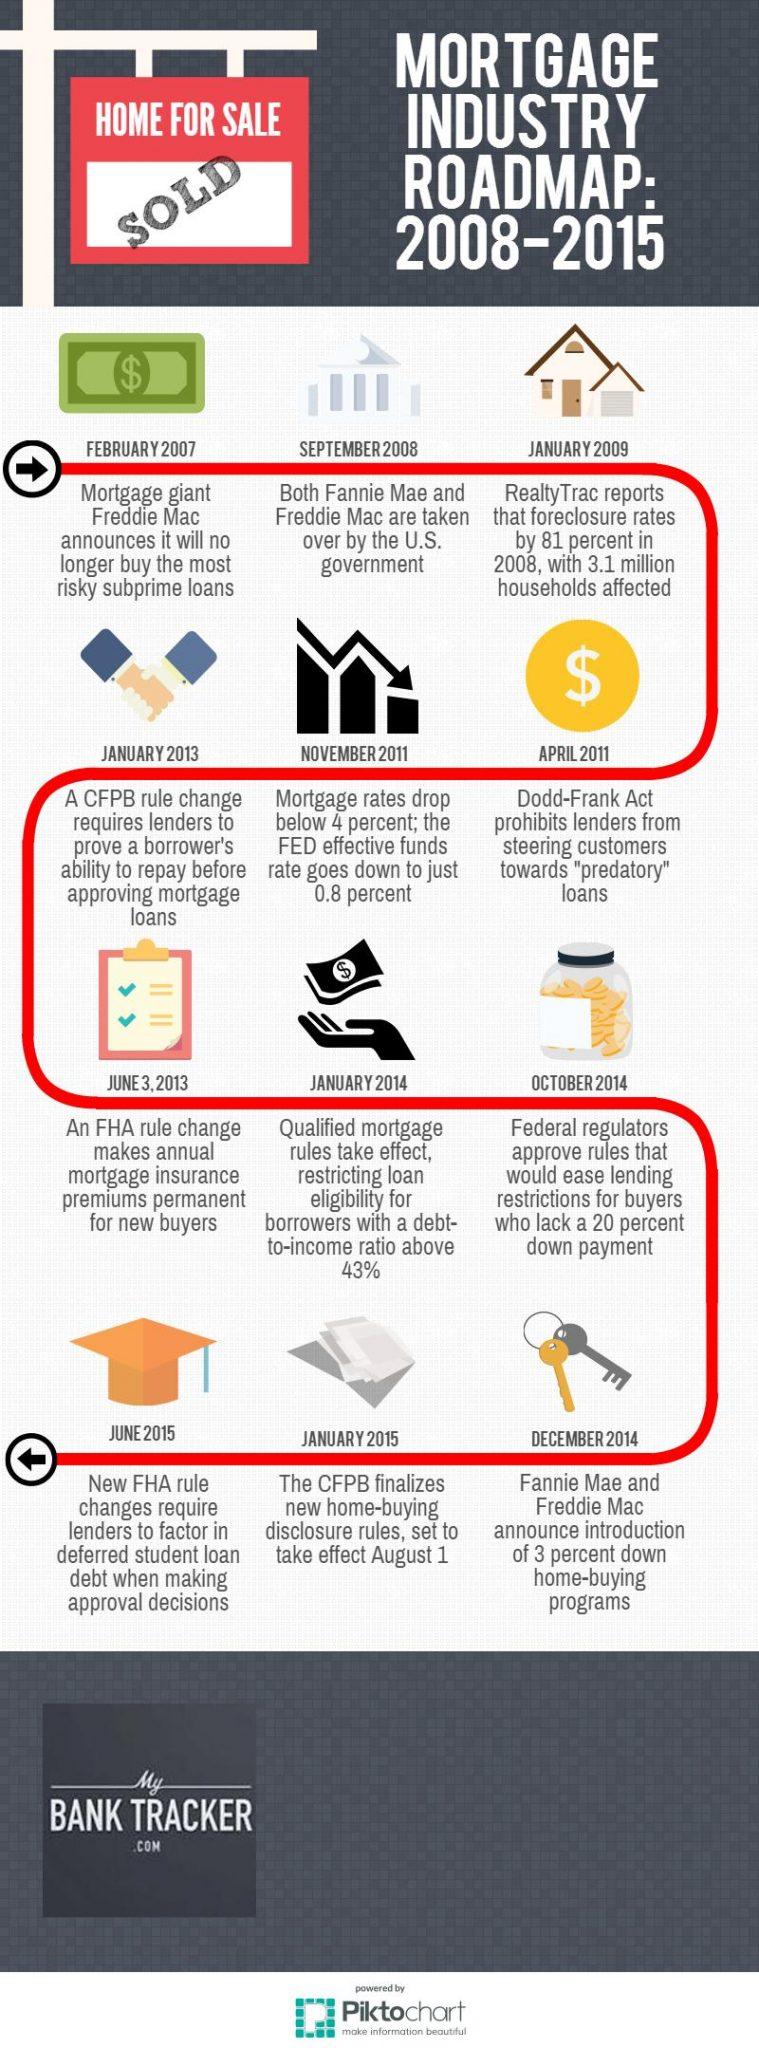 Mortgage Industry Timeline (1)